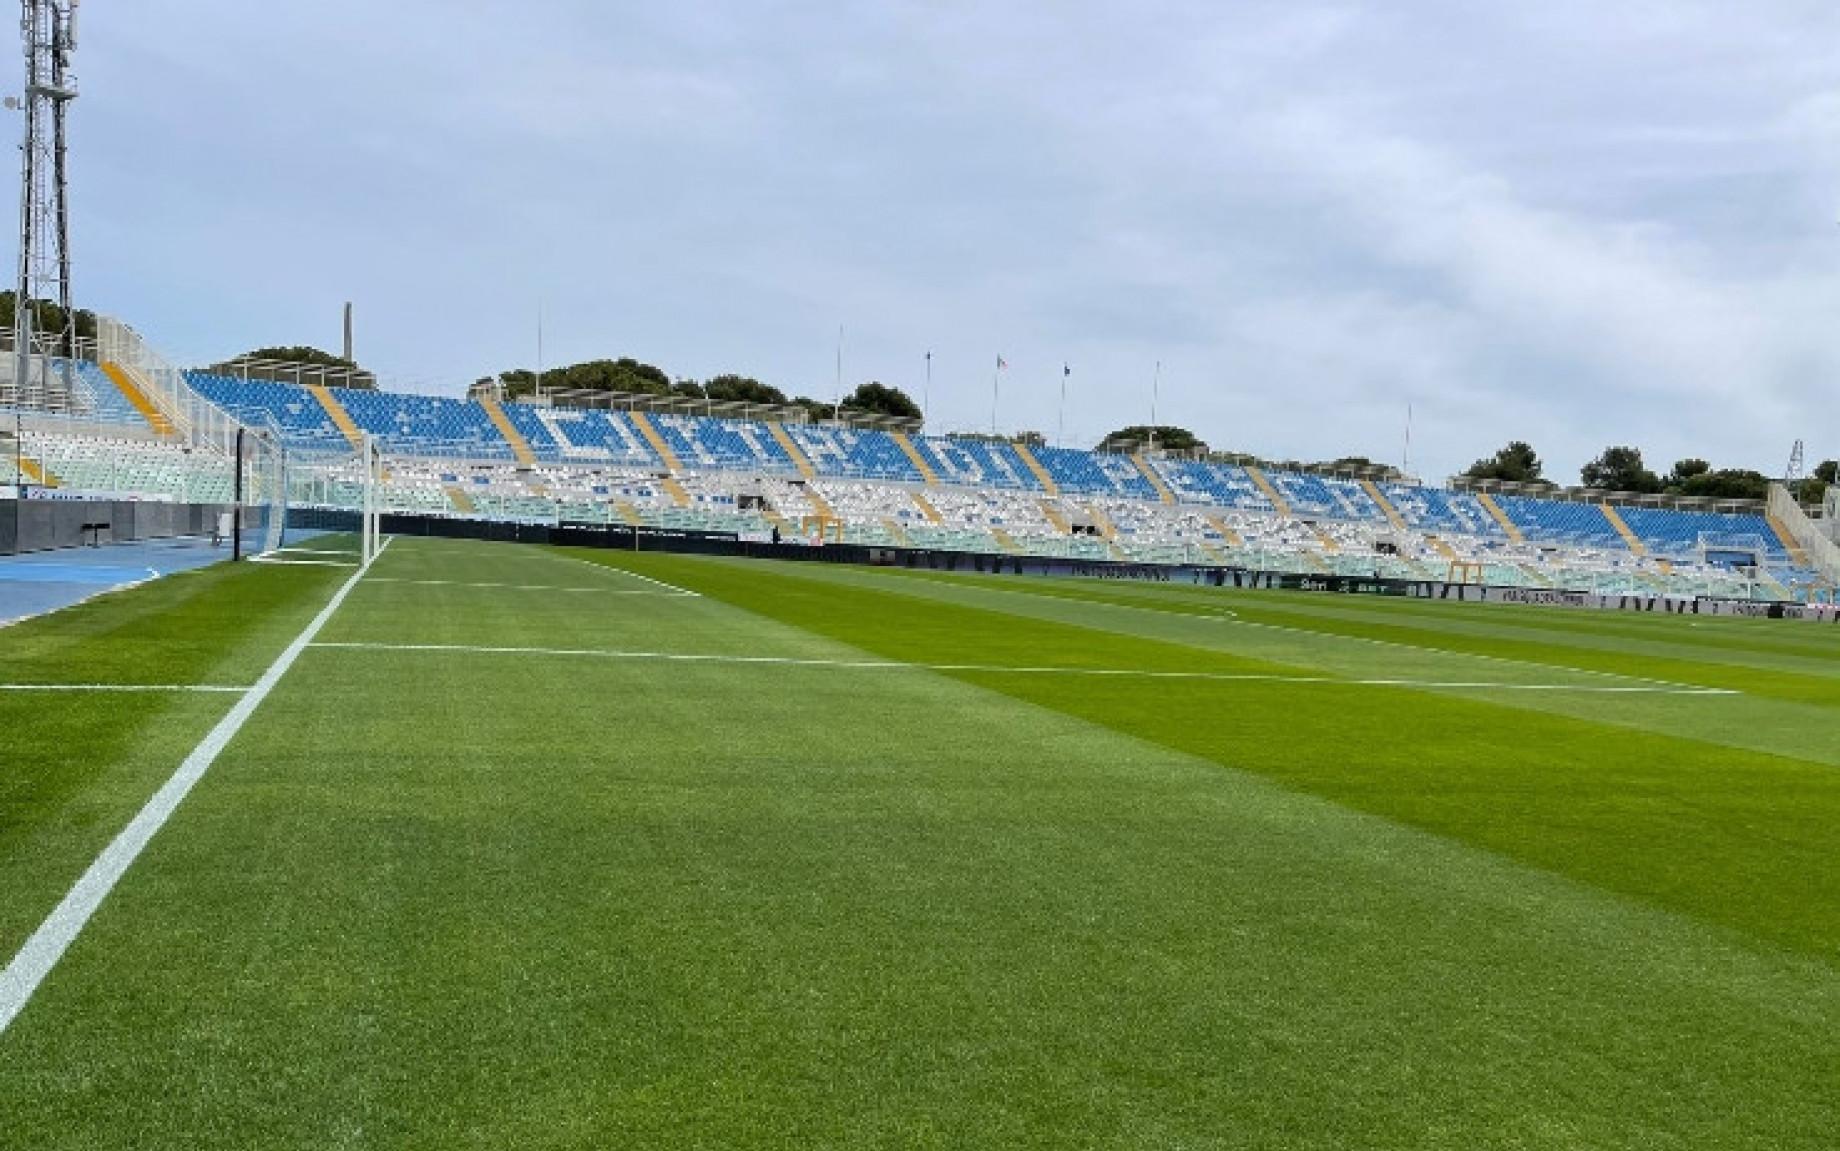 stadio-adriatico-gdm.jpg